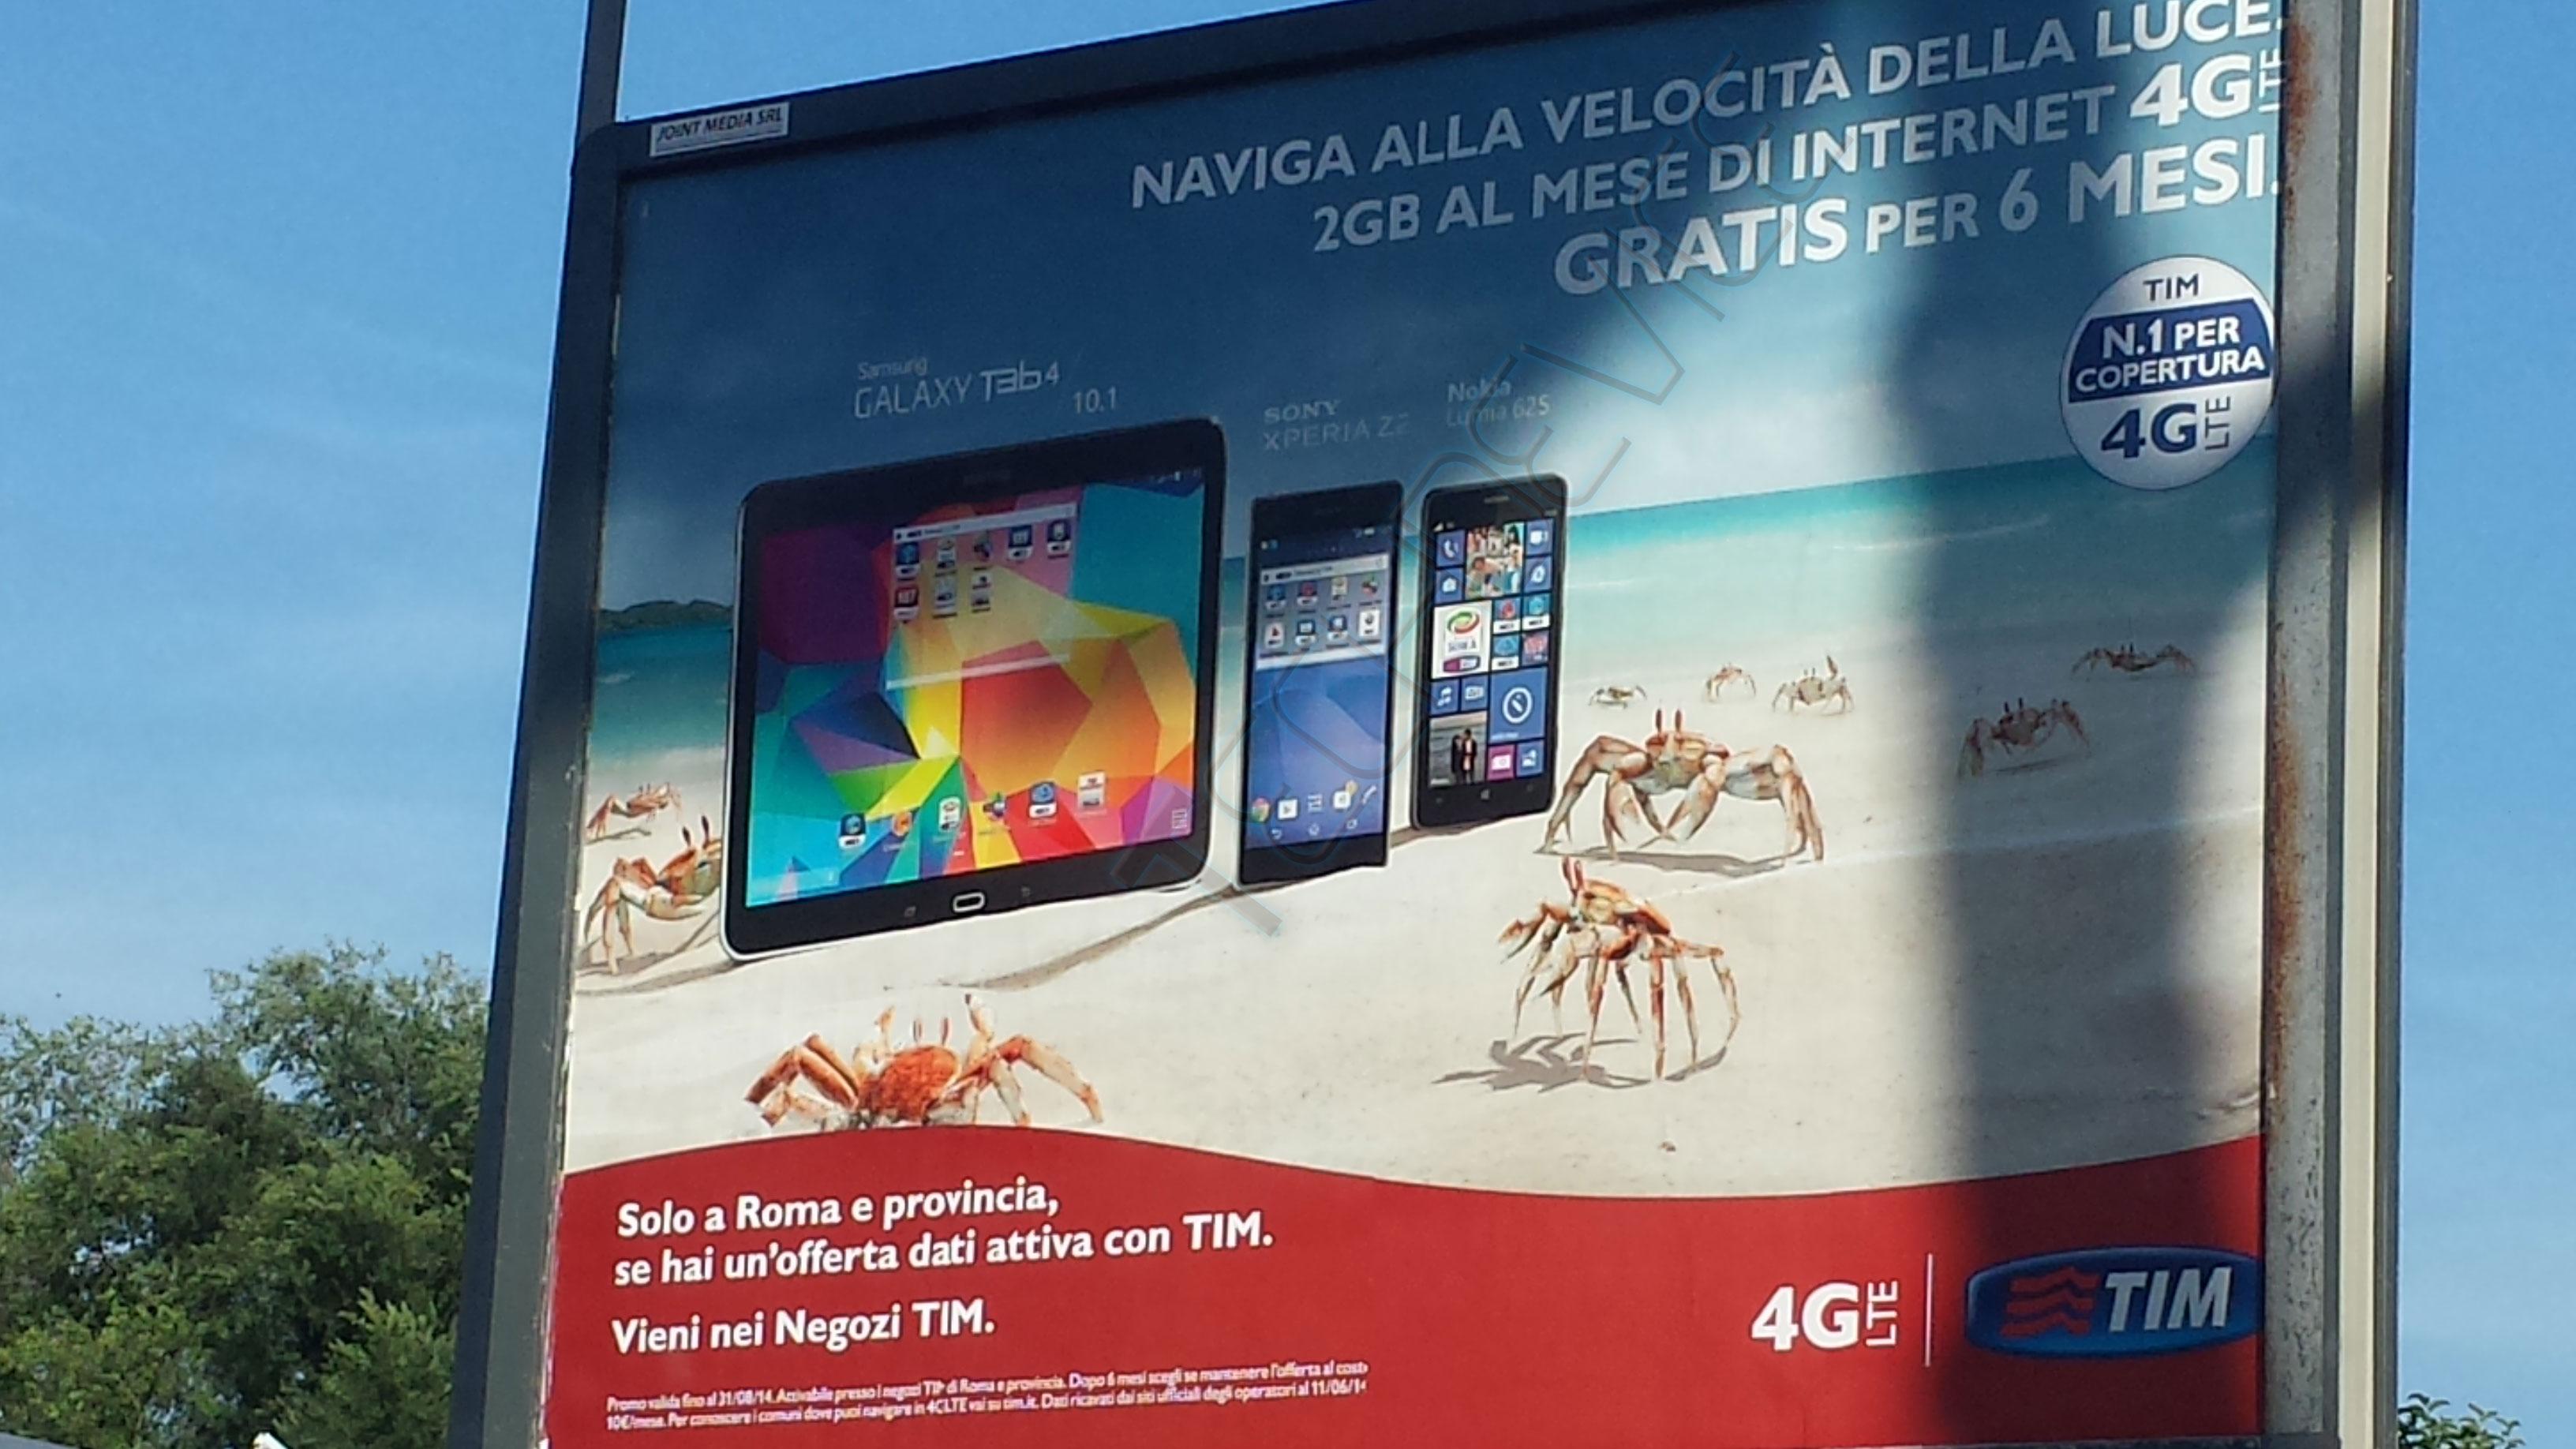 4g internet promo internet 4g per 6 mesi for Disattivazione servizi vas tim